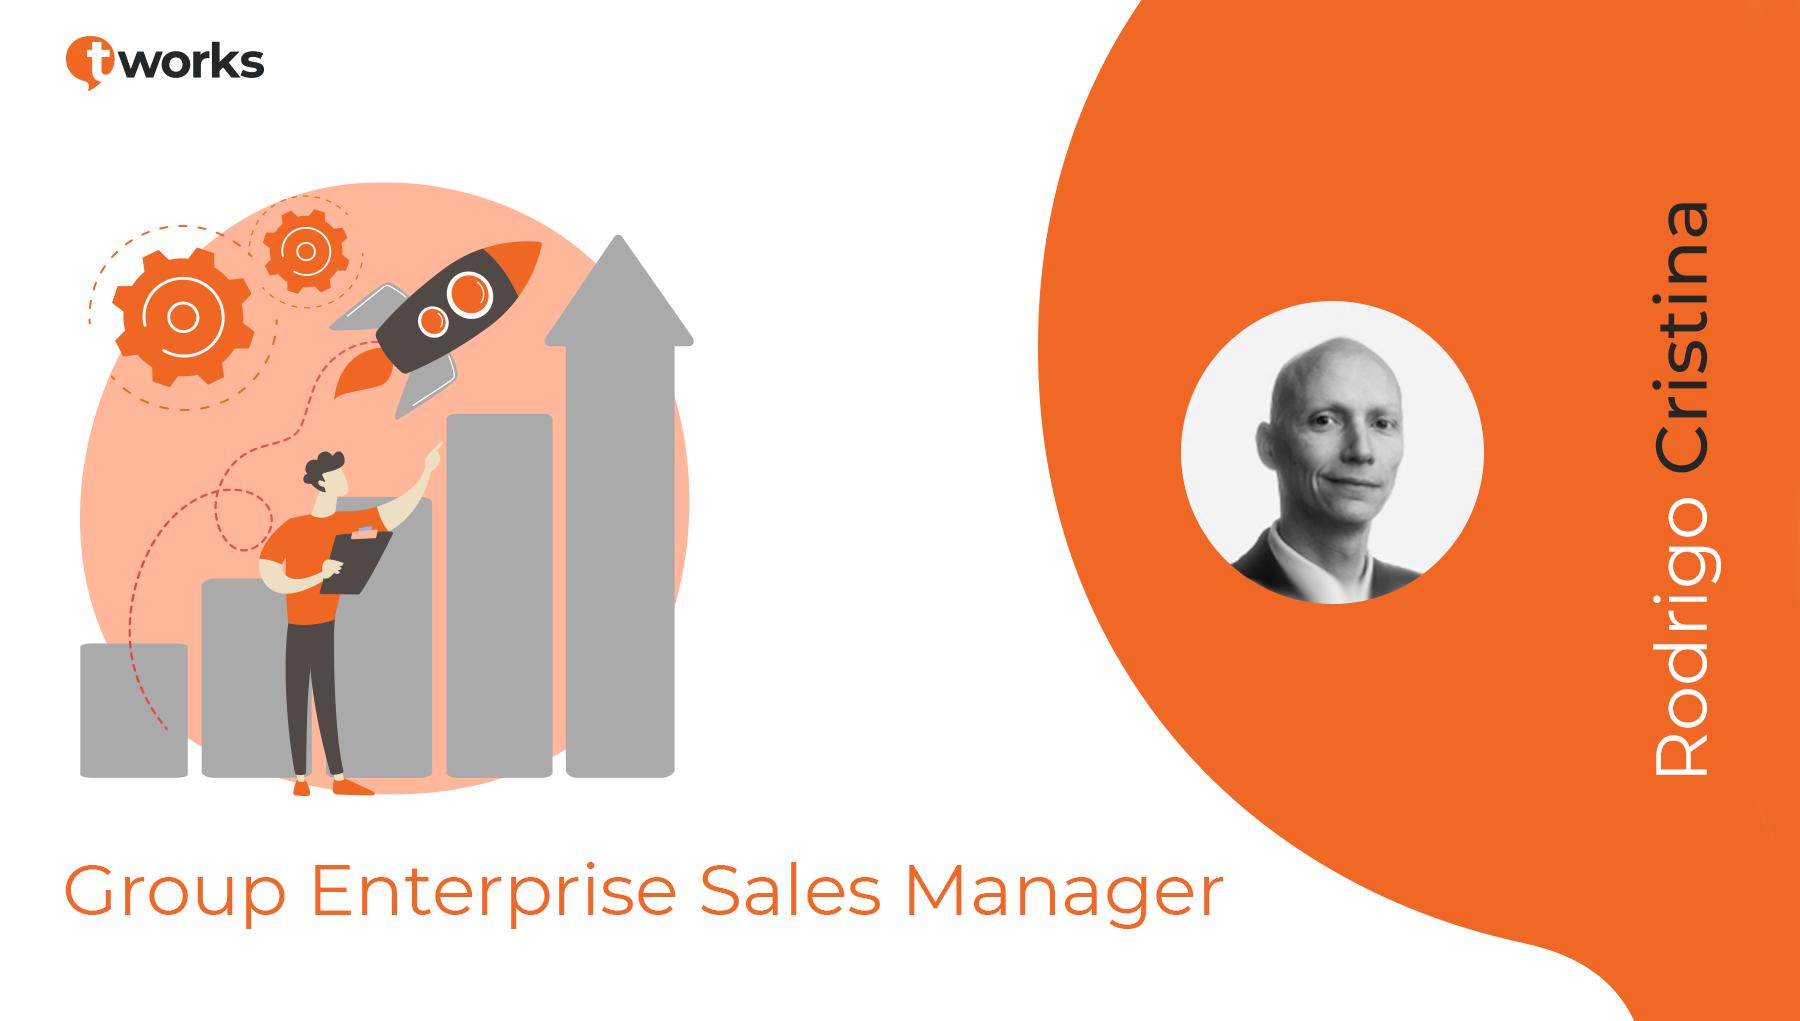 Rodrigo Cristina, Group Enterprise Sales Manager by t'works